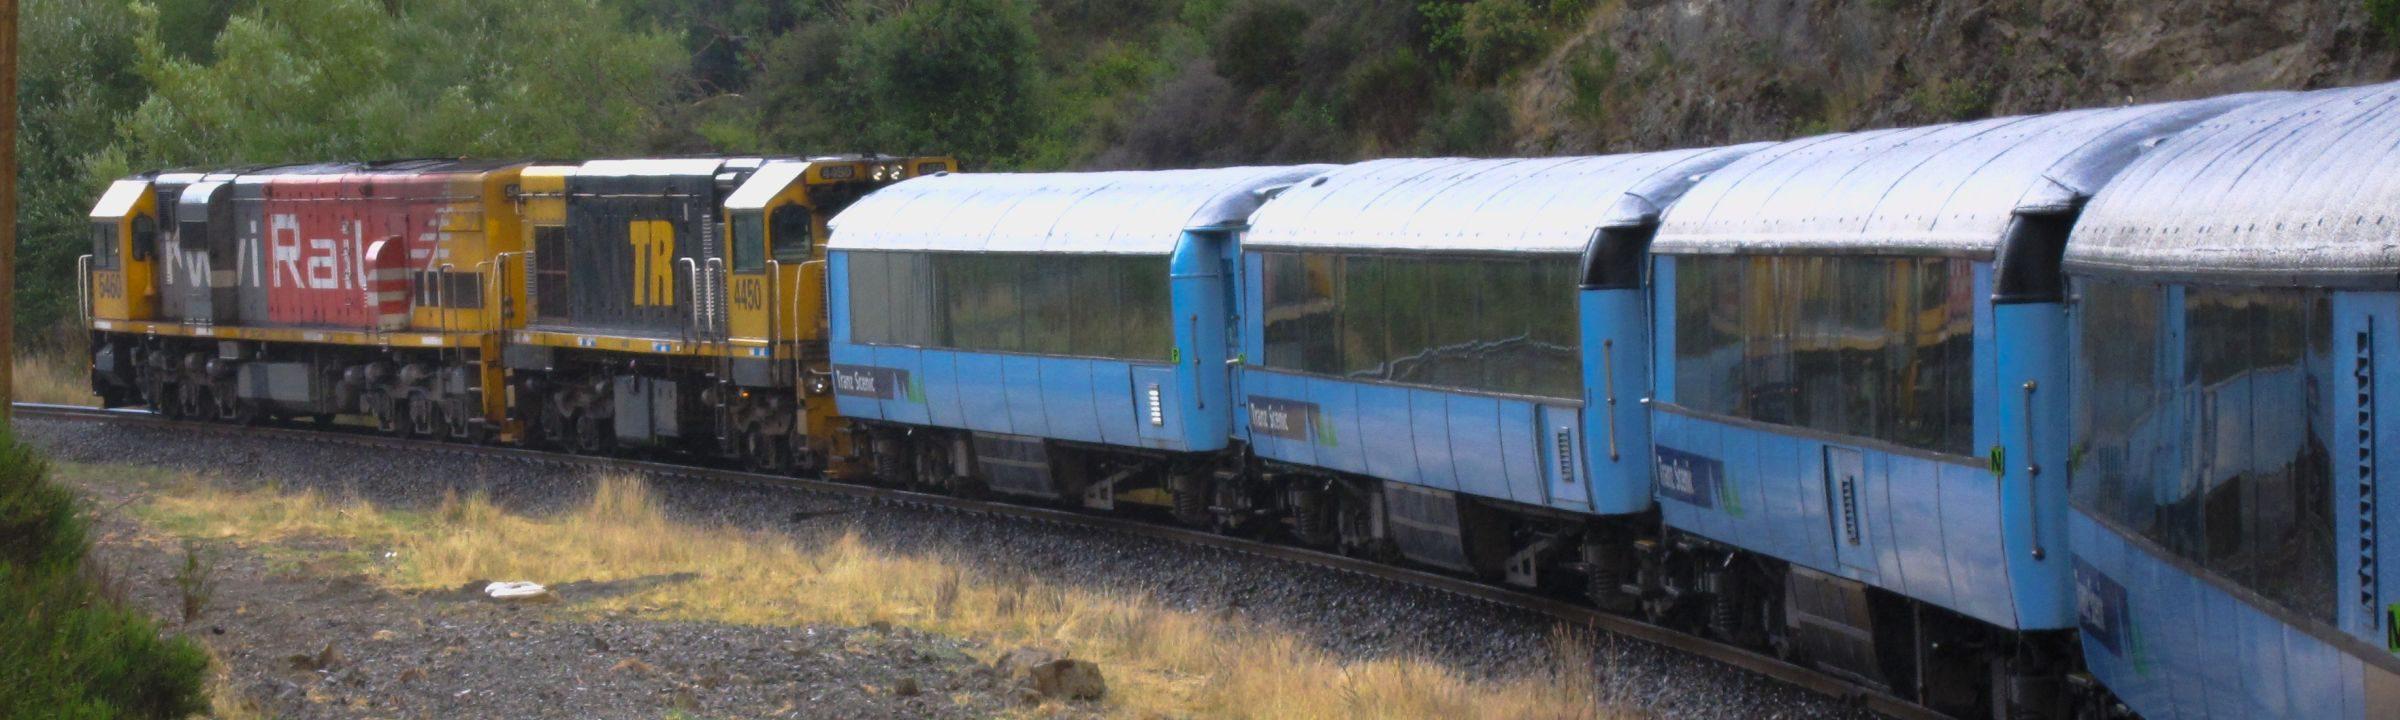 Kiwi Rail unterwegs nach Greymouth